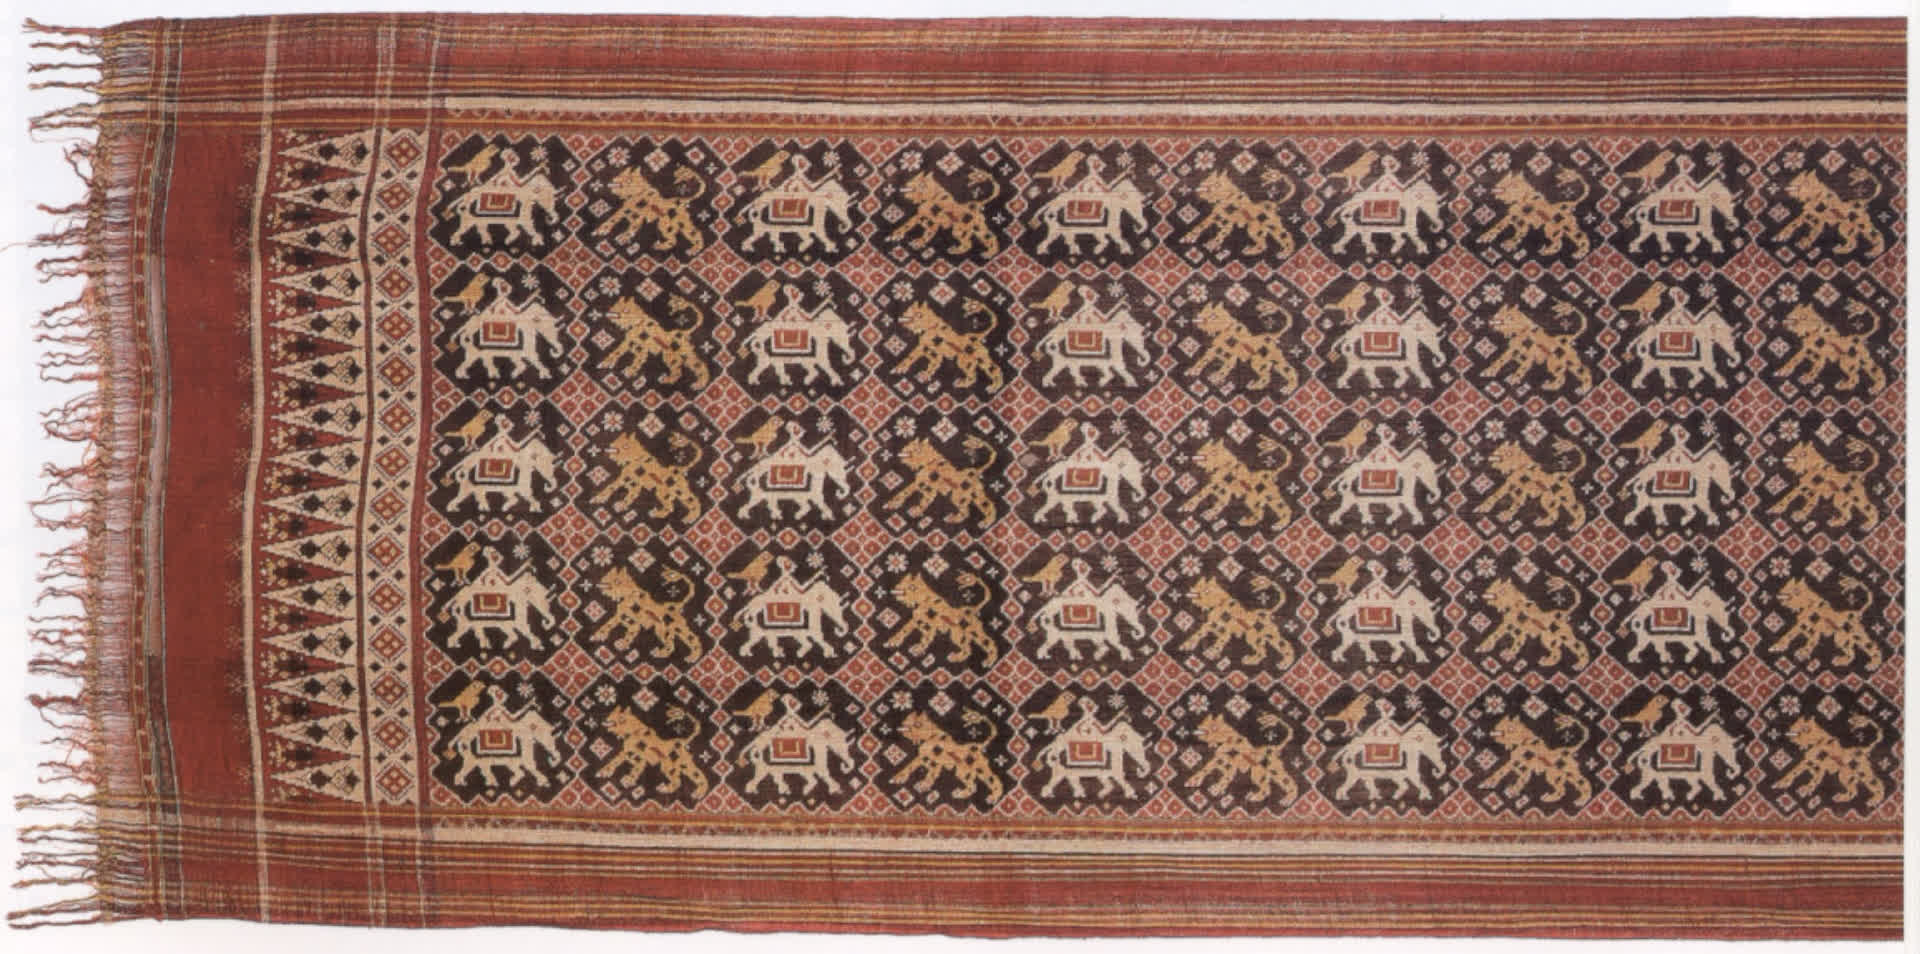 Patan Patola from 18th Century